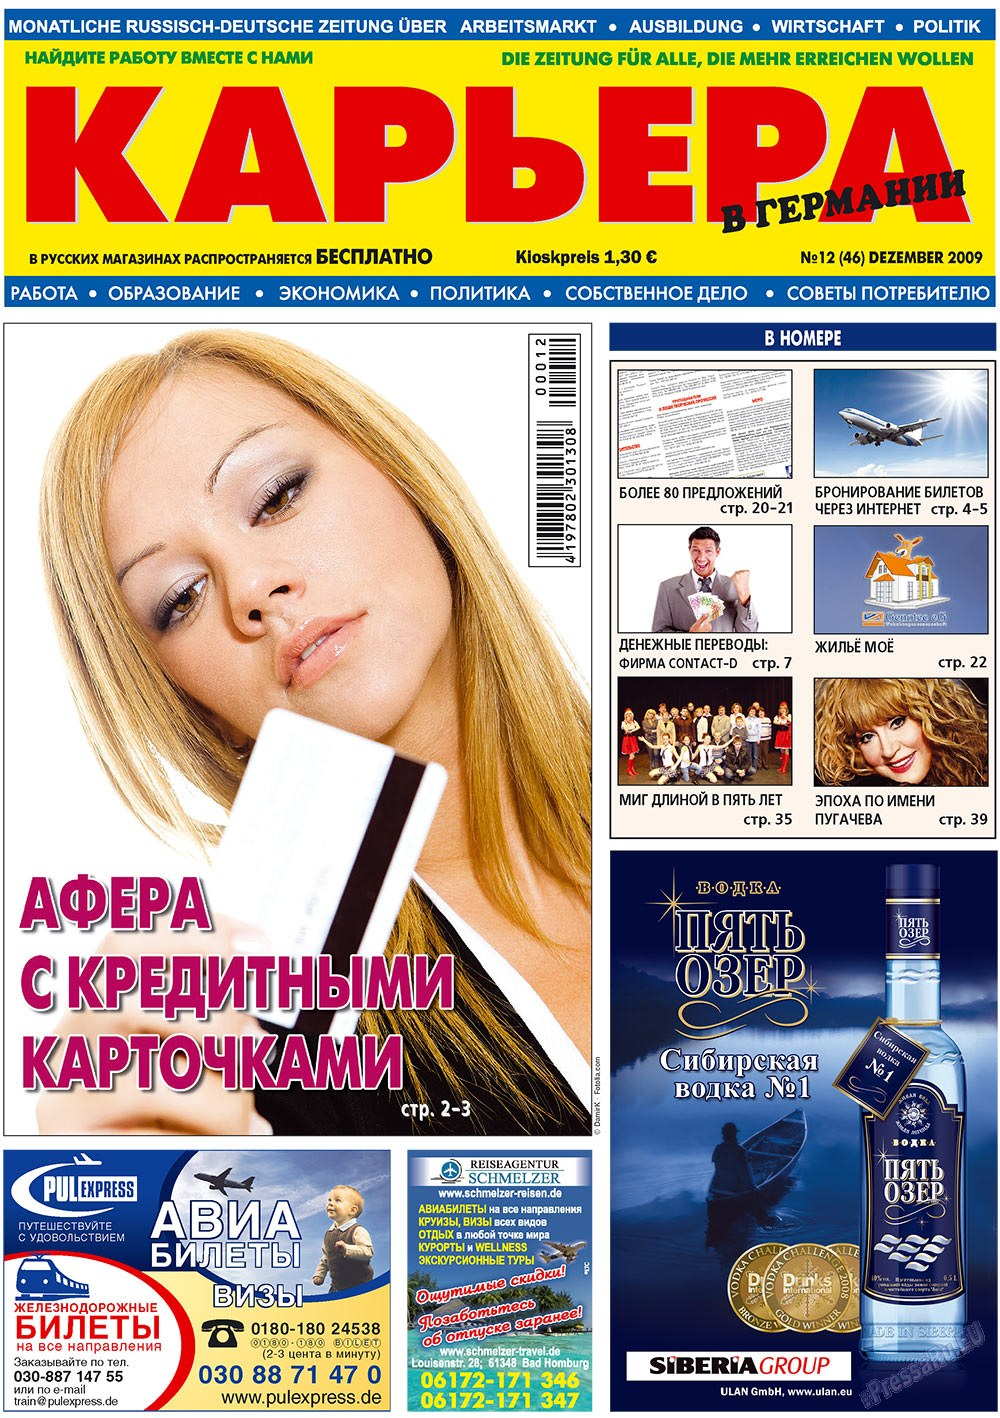 Карьера (газета). 2009 год, номер 12, стр. 1